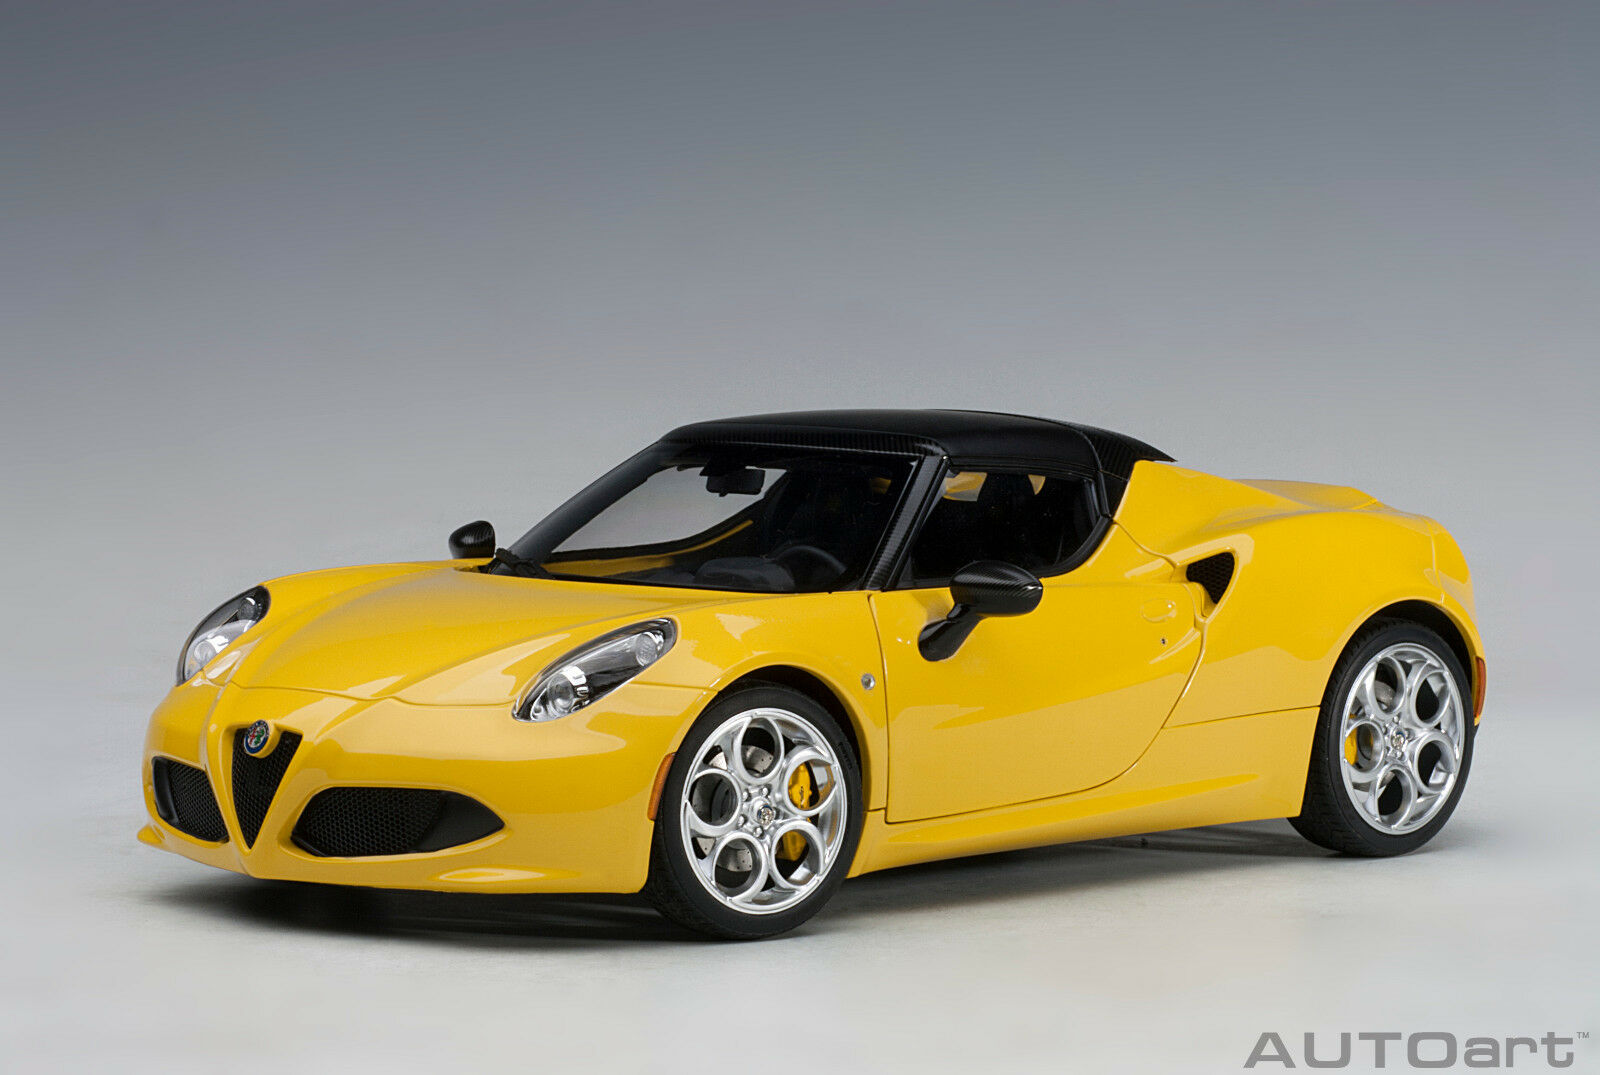 70143 Alfa Romeo 4C 4C 4C Spider (yellow Predo Tipo   Yellow) , 1 18 Autoart 09625c